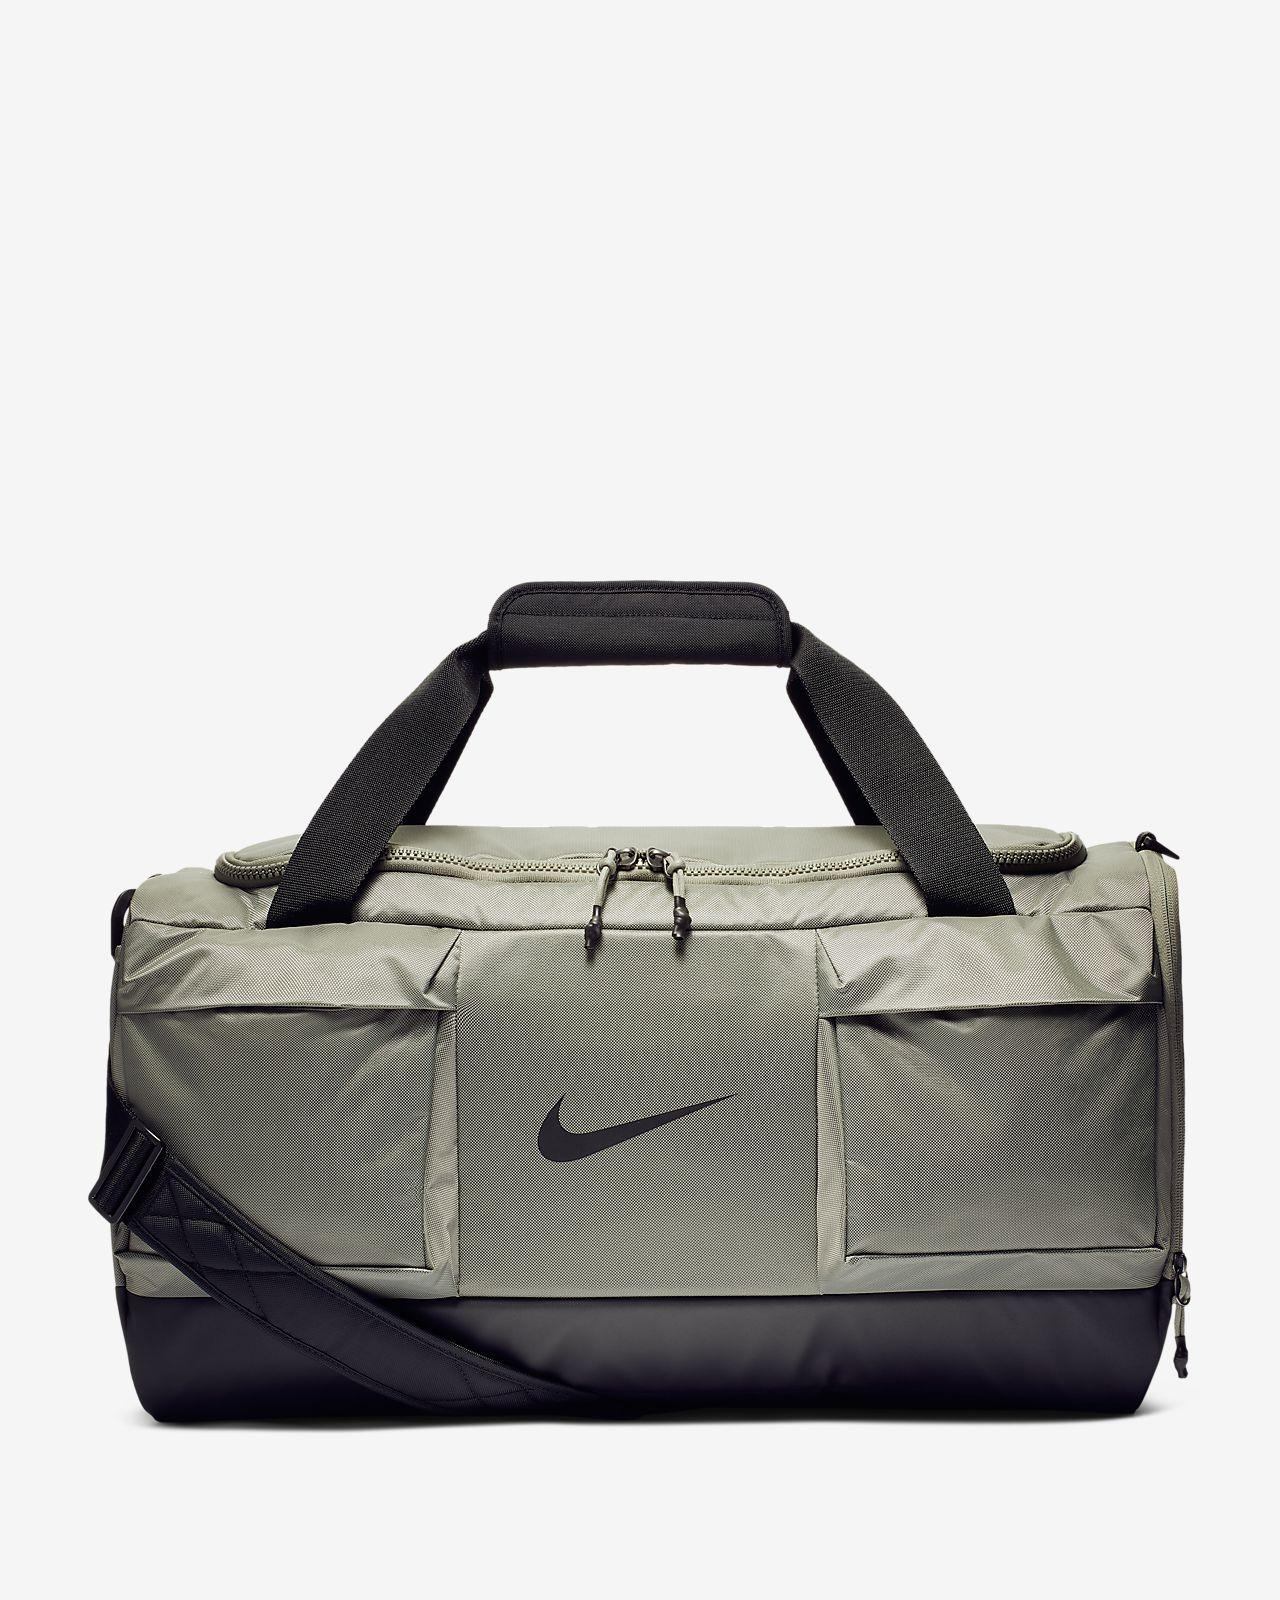 Nike Vapor Power Men s Training Duffel Bag (Medium). Nike.com AU 5e2b80b7447ed